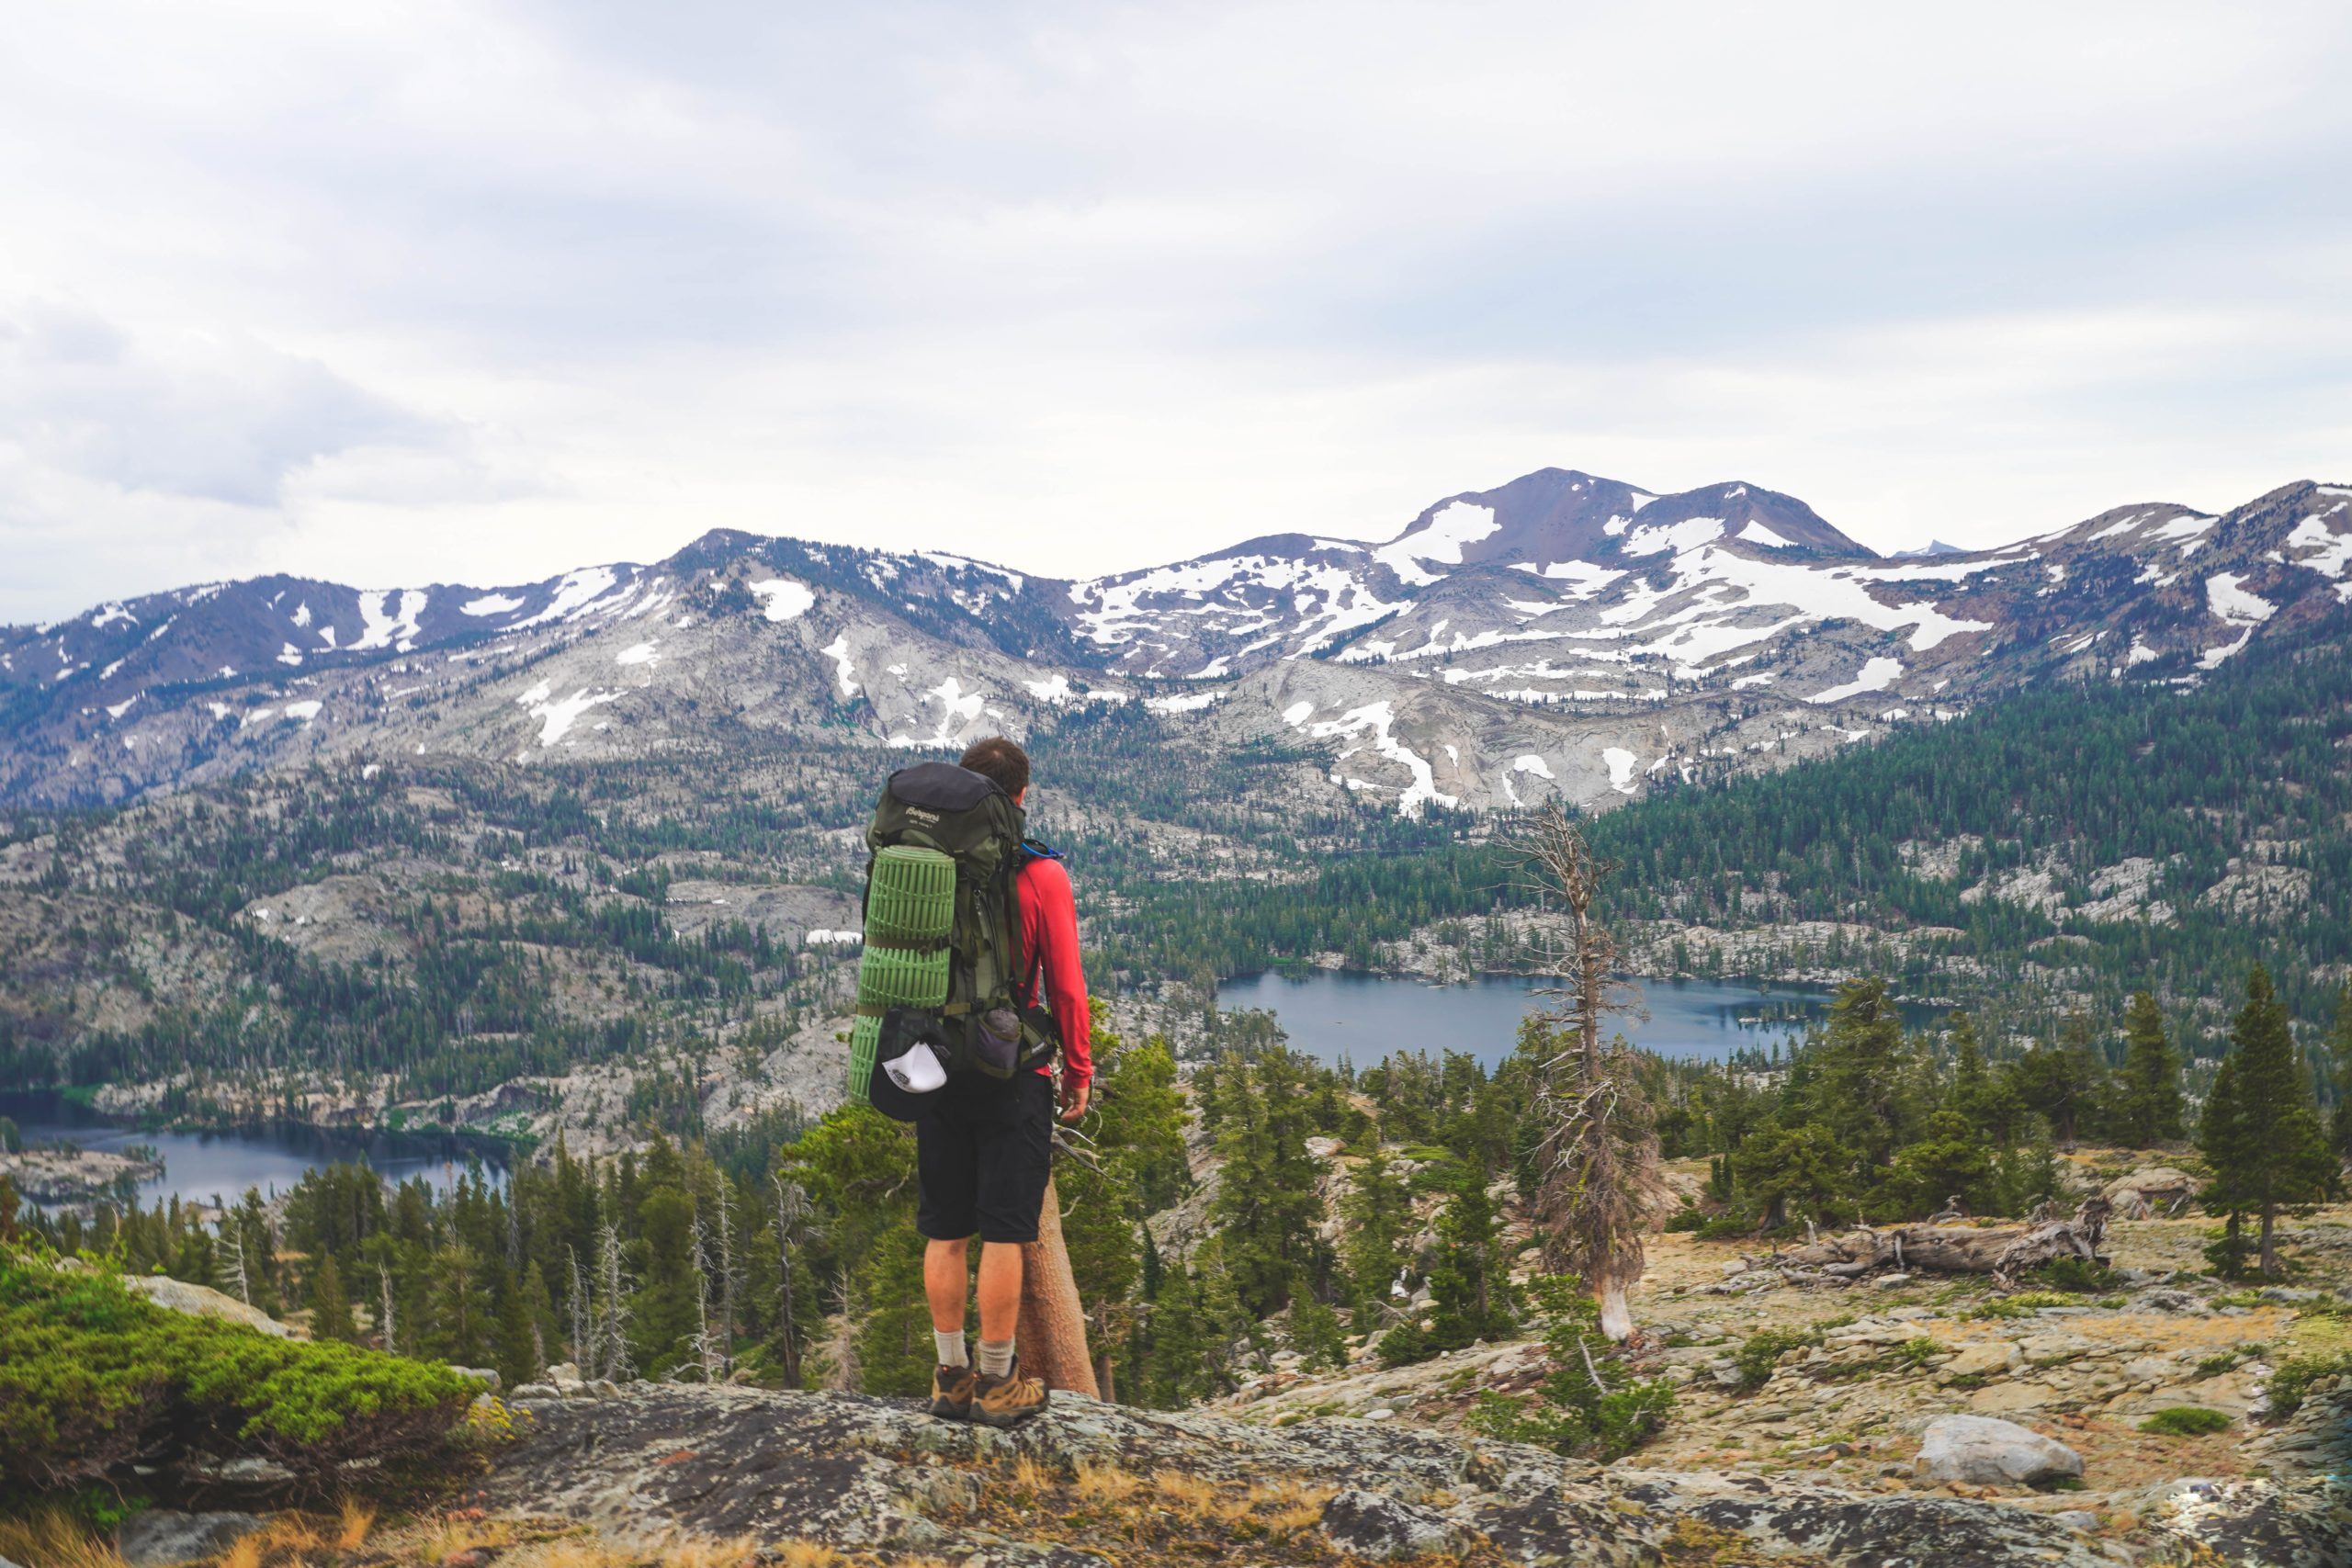 Hiker standing on ledge looking over Lake Tahoe